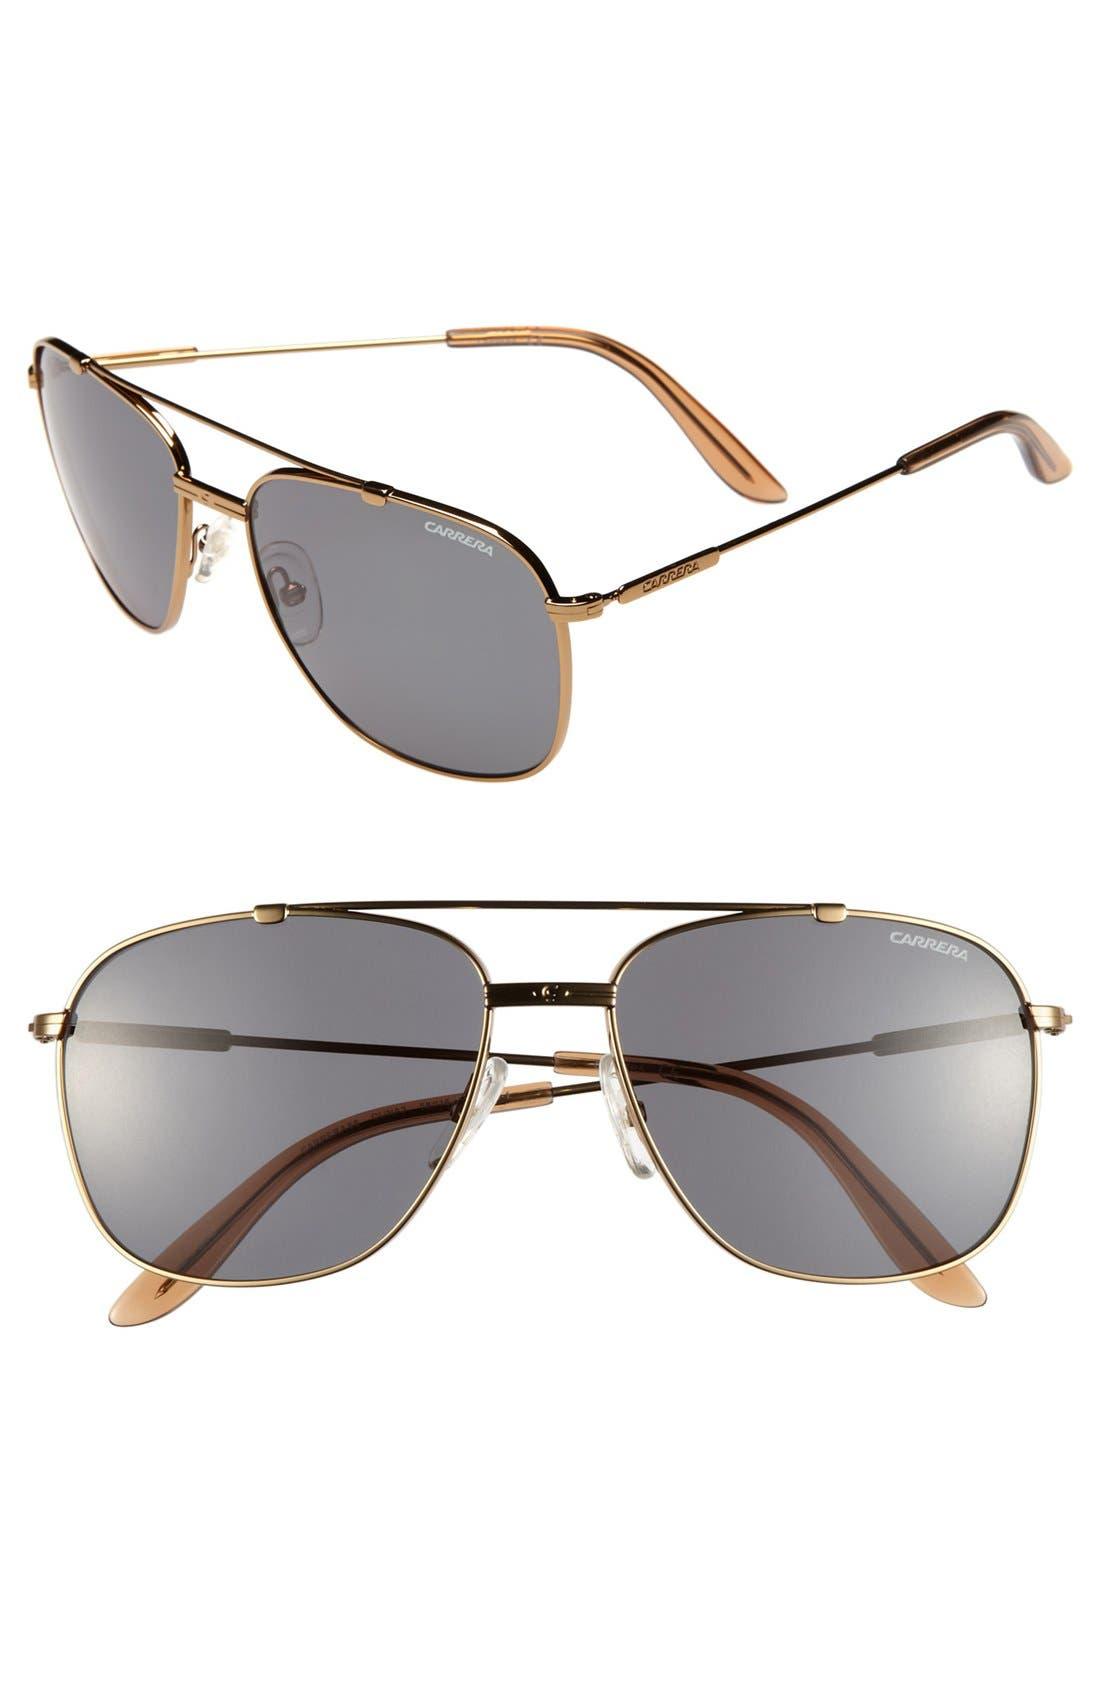 Main Image - Carrera Eyewear 58mm Sunglasses